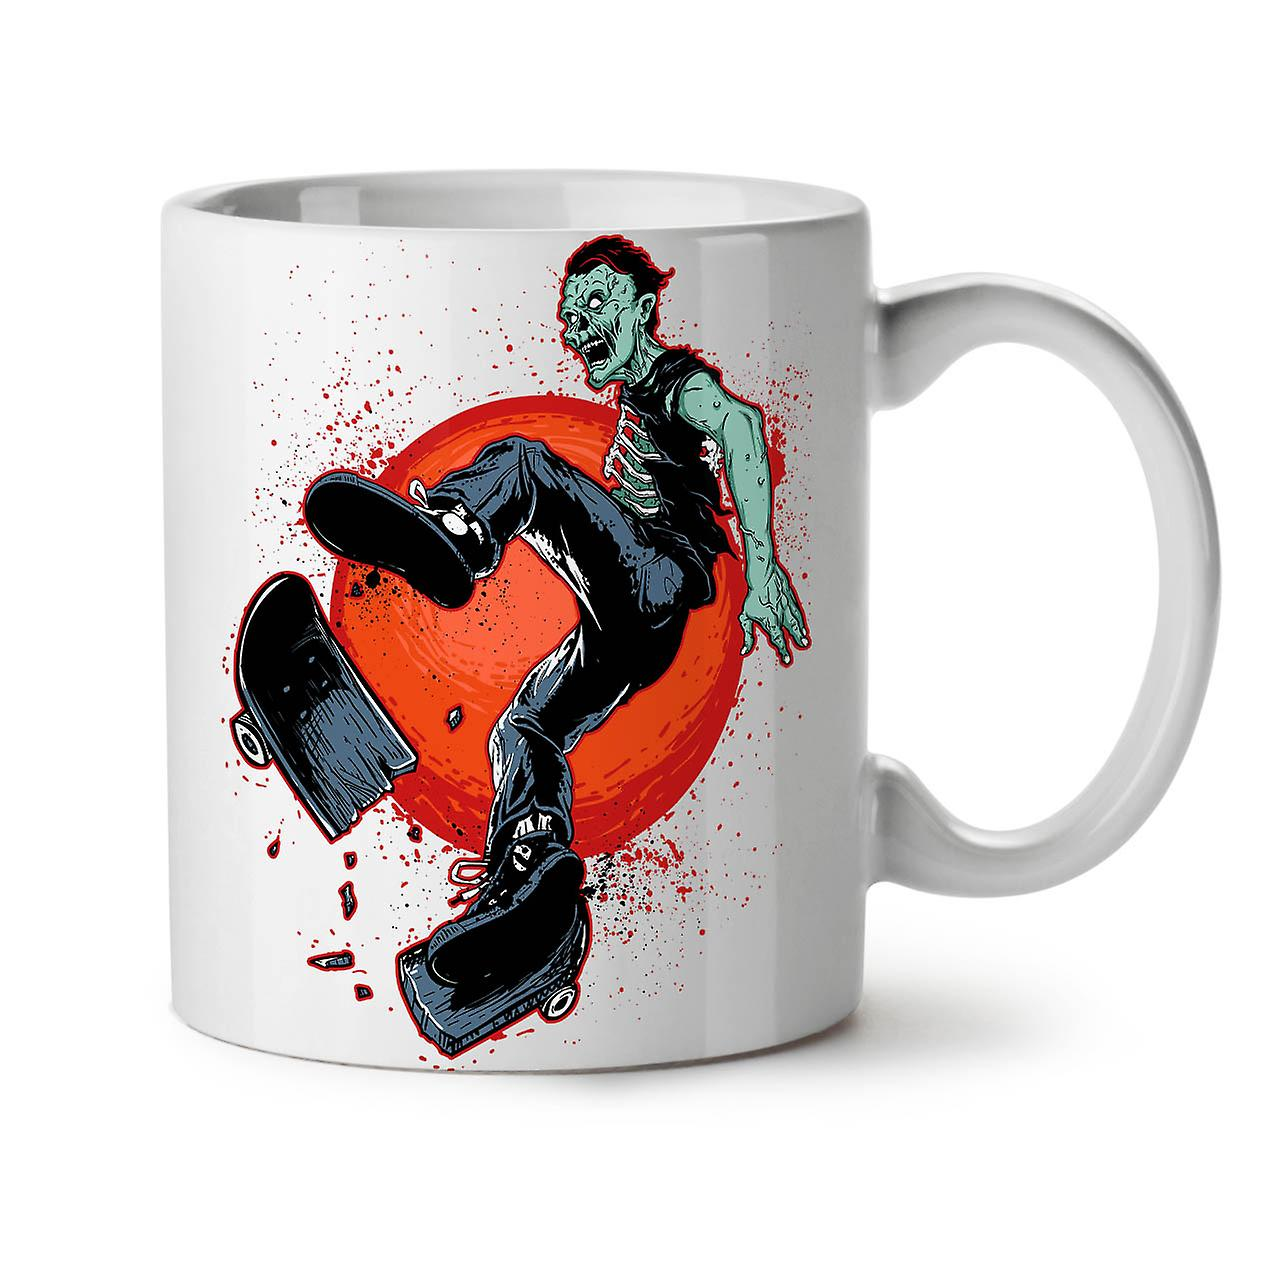 Guy Coffee Tea Bad Skater Cool Ceramic New Mug 11 OzWellcoda White zVqpGMSU